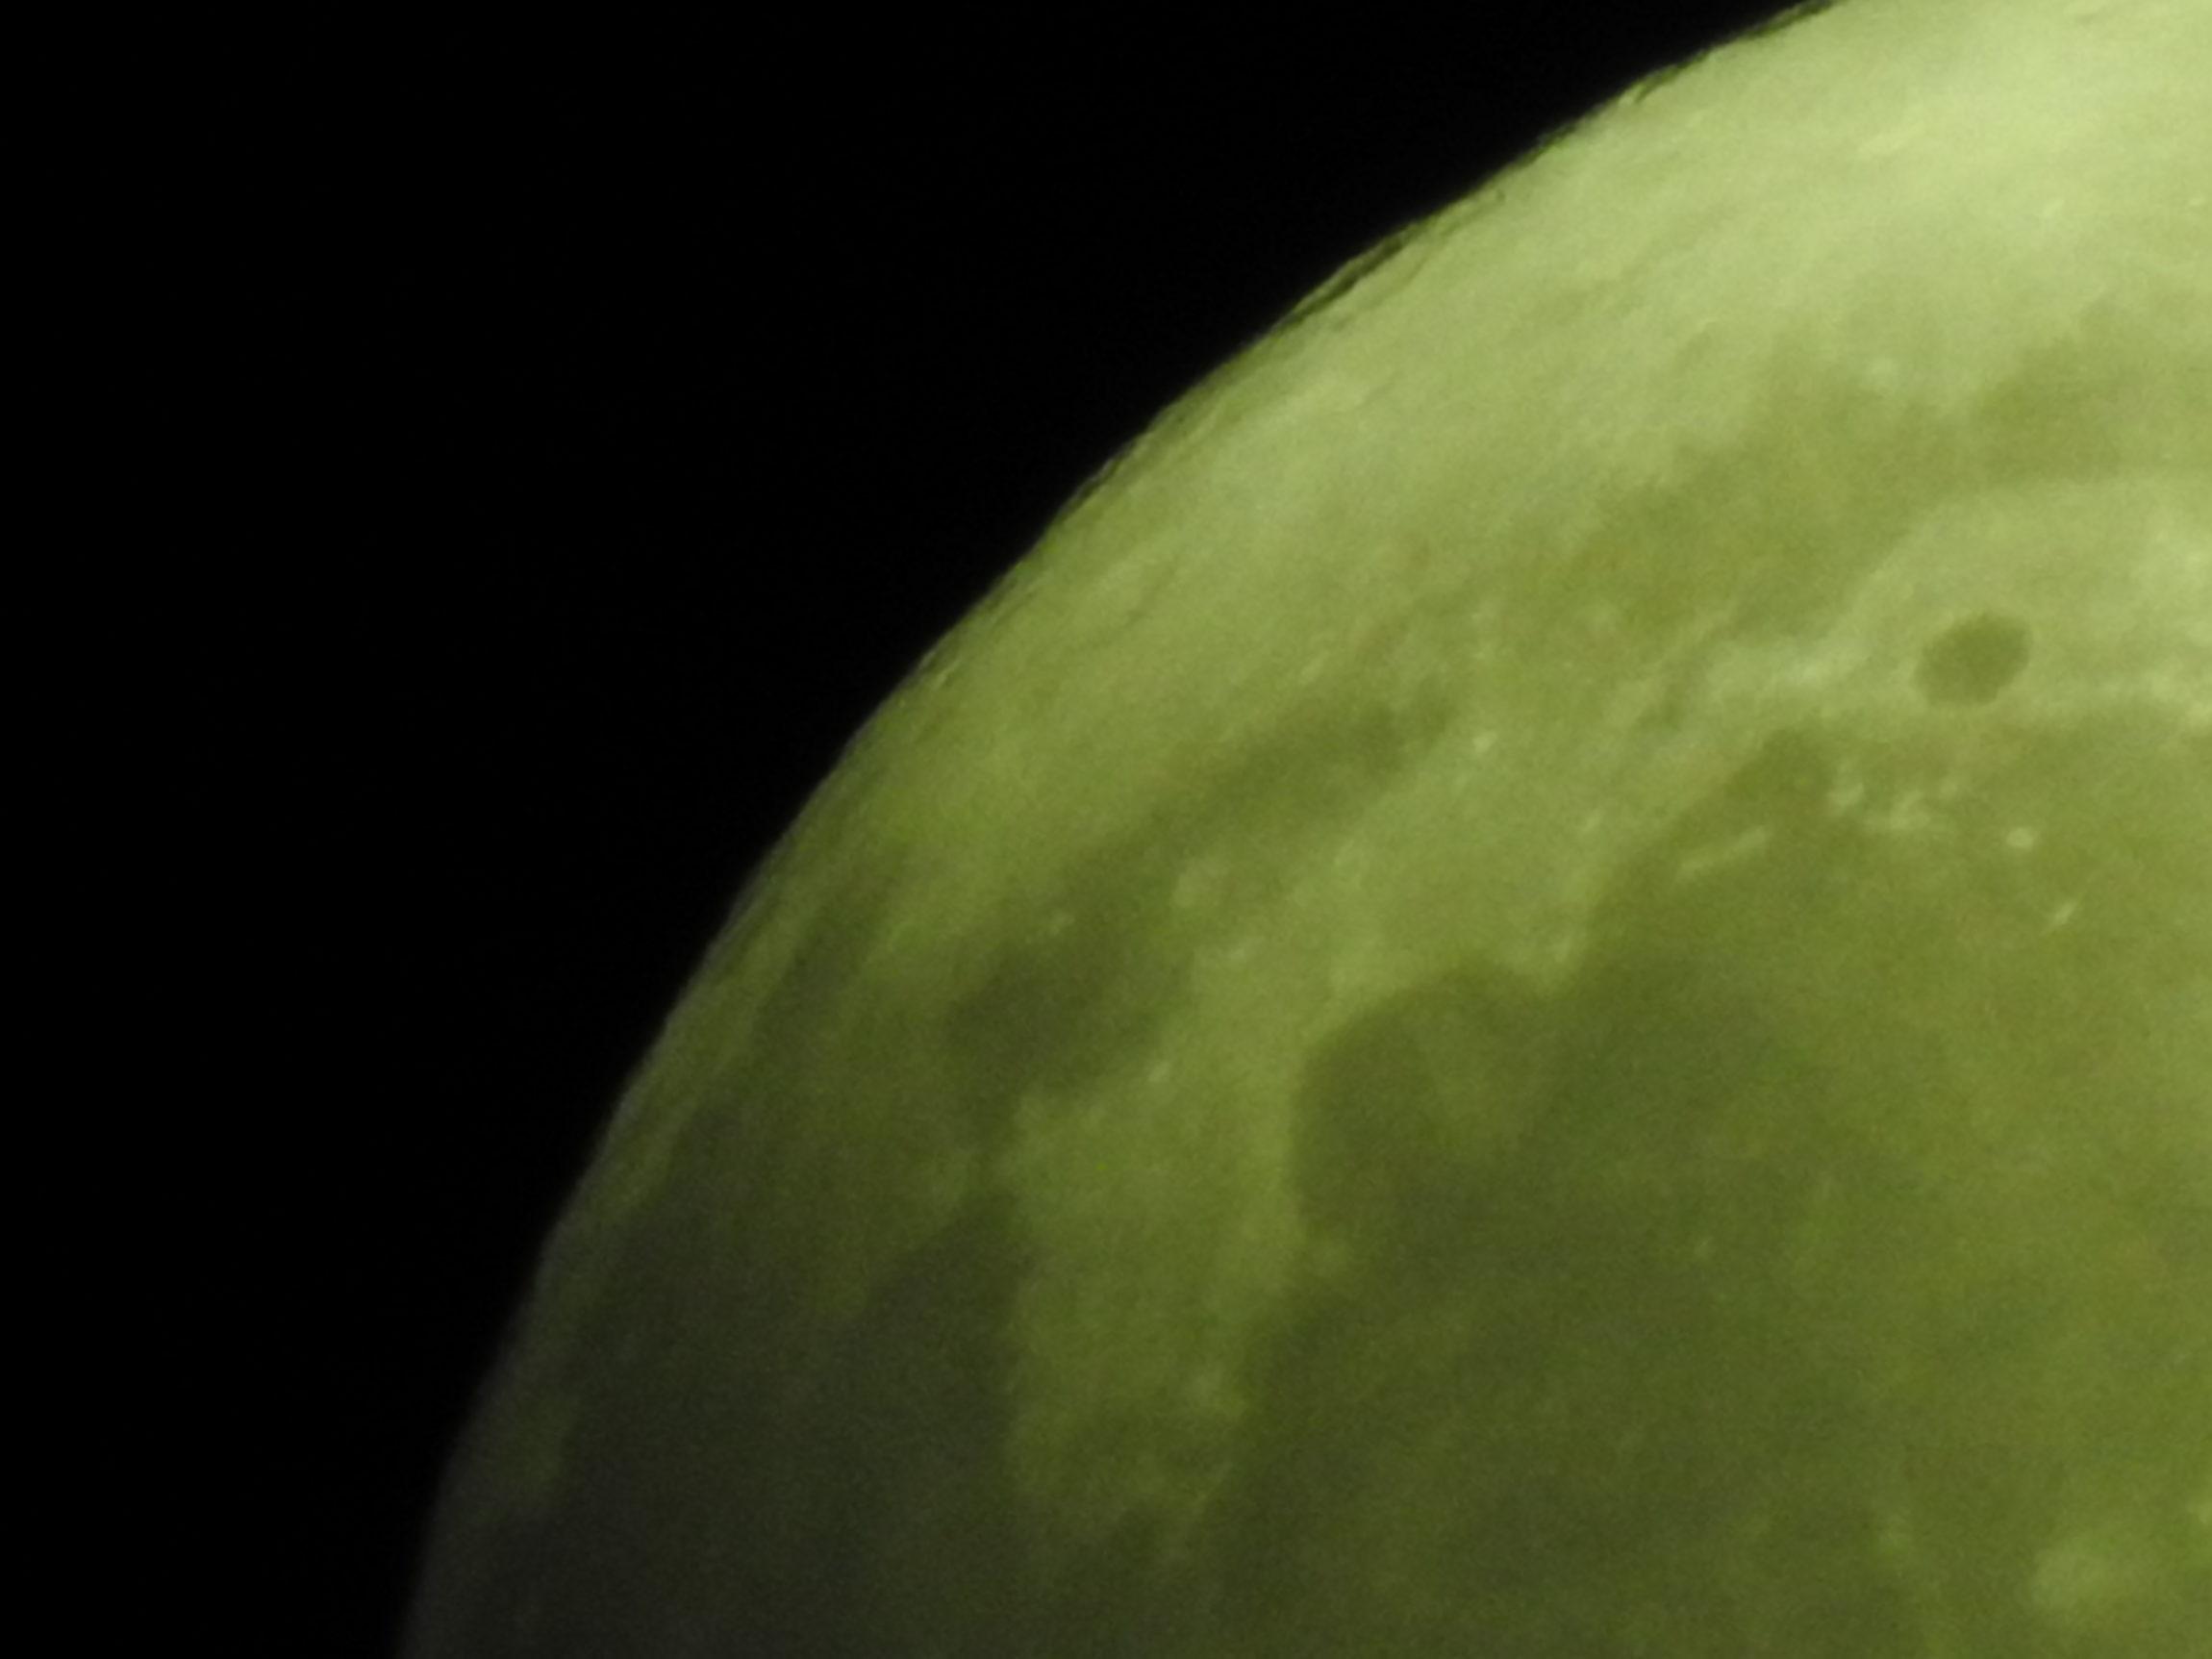 Rare 'Green Moon' in April?